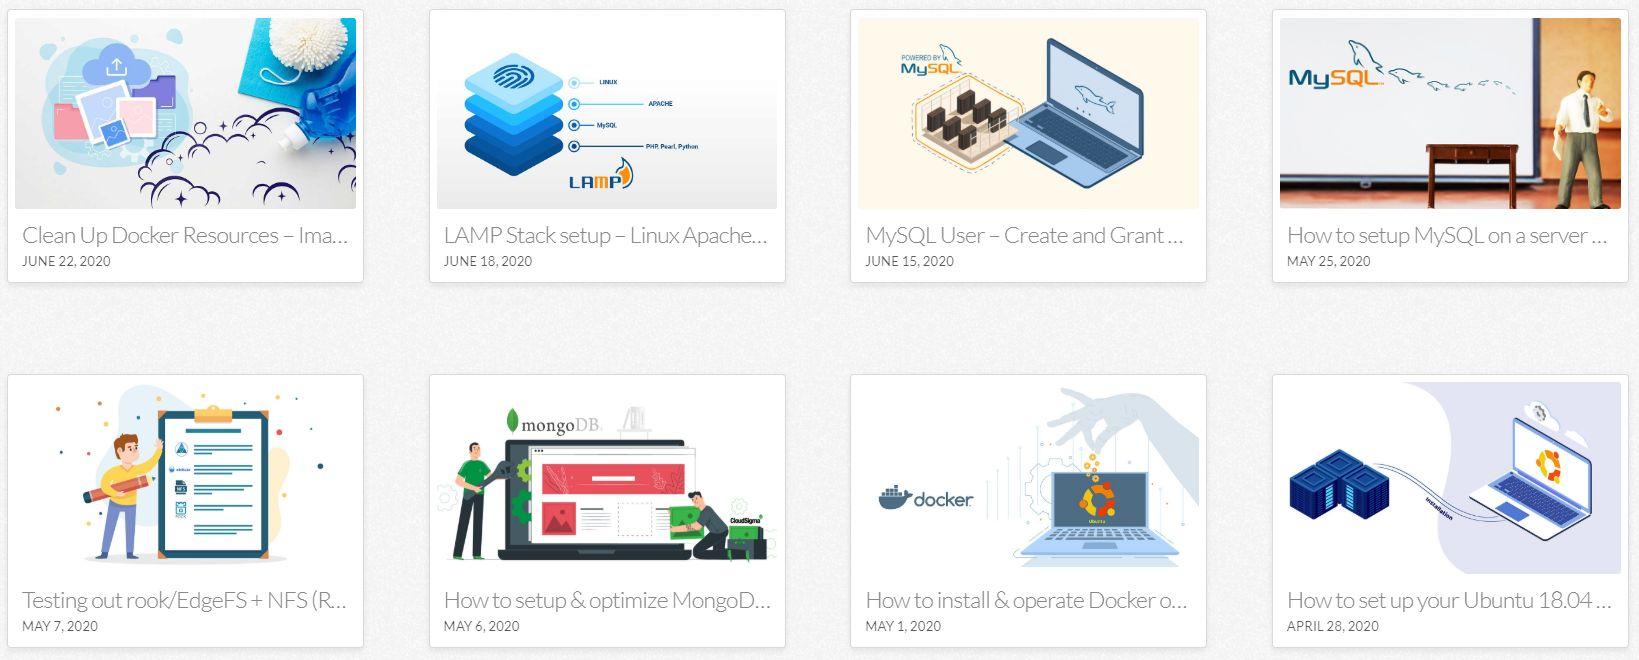 cloudsigma-support-tutorials